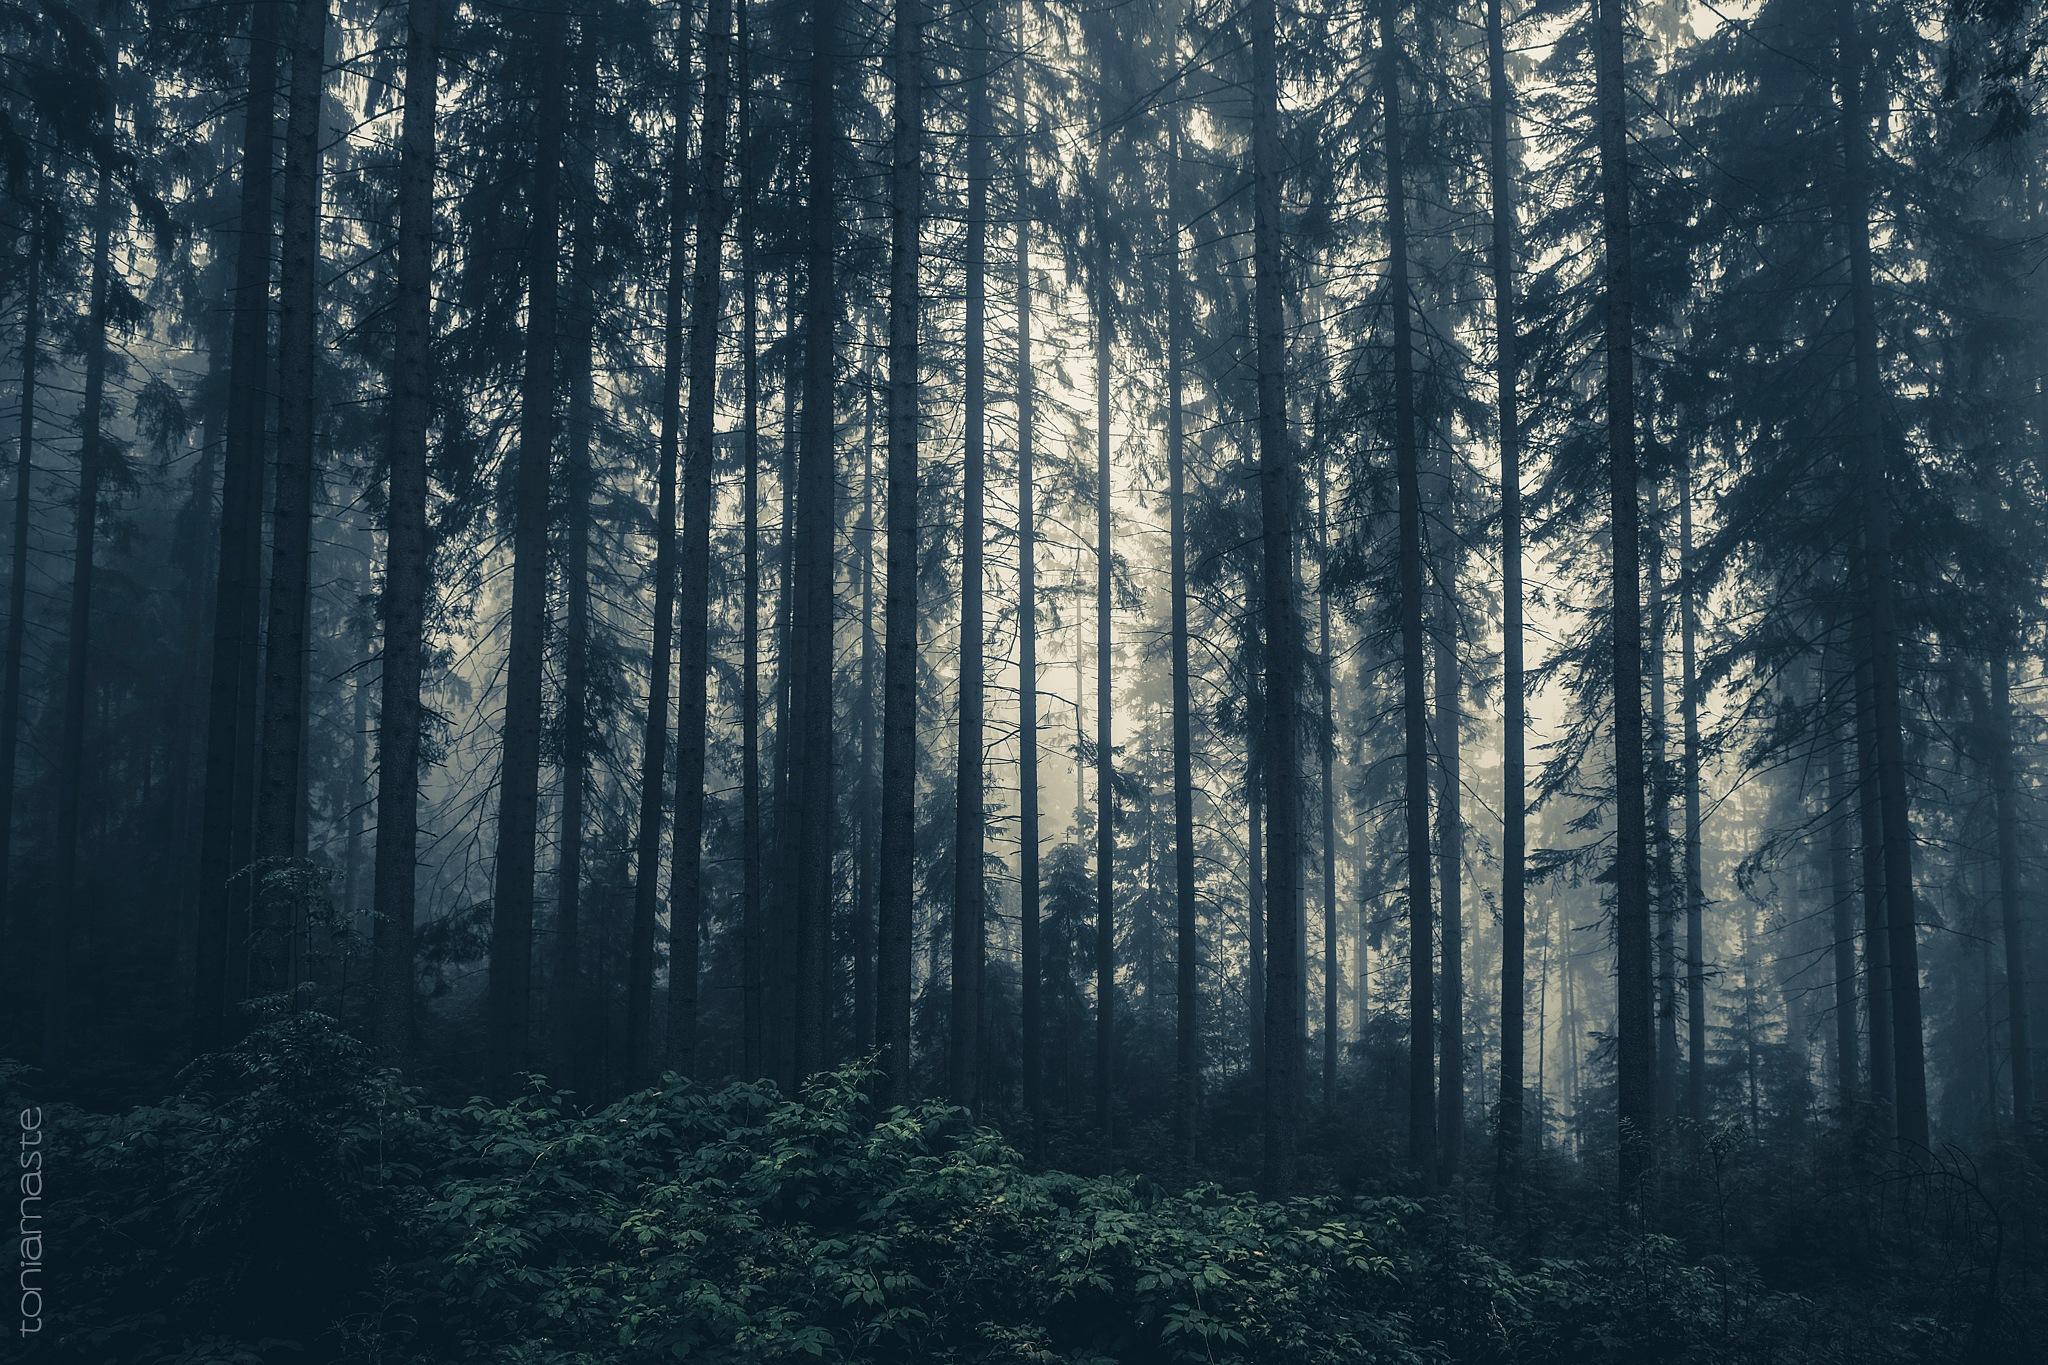 The eternal struggle between fog and light by Toni Arnaste